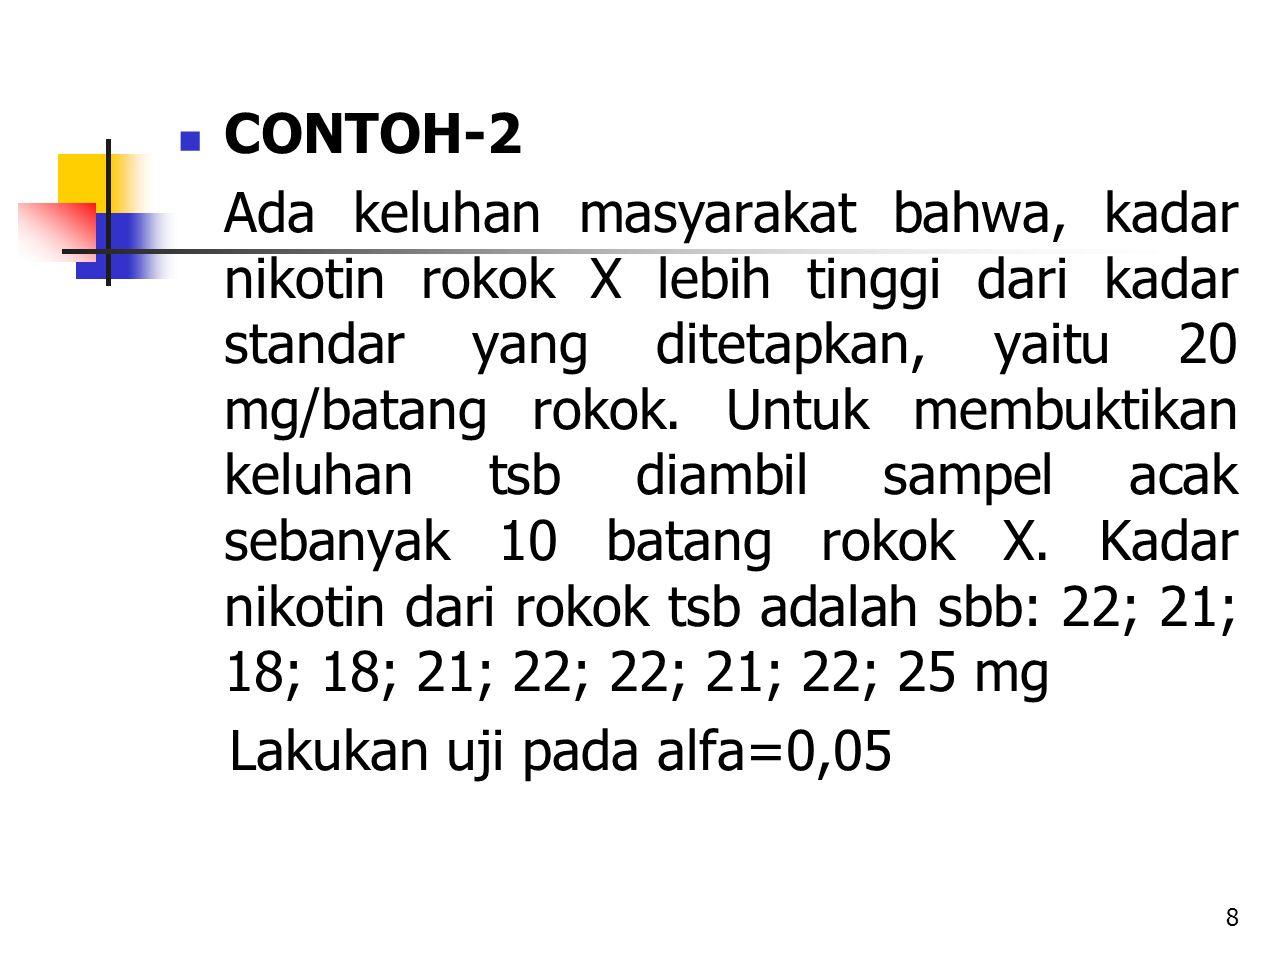 CONTOH-2 Ada keluhan masyarakat bahwa, kadar nikotin rokok X lebih tinggi dari kadar standar yang ditetapkan, yaitu 20 mg/batang rokok.